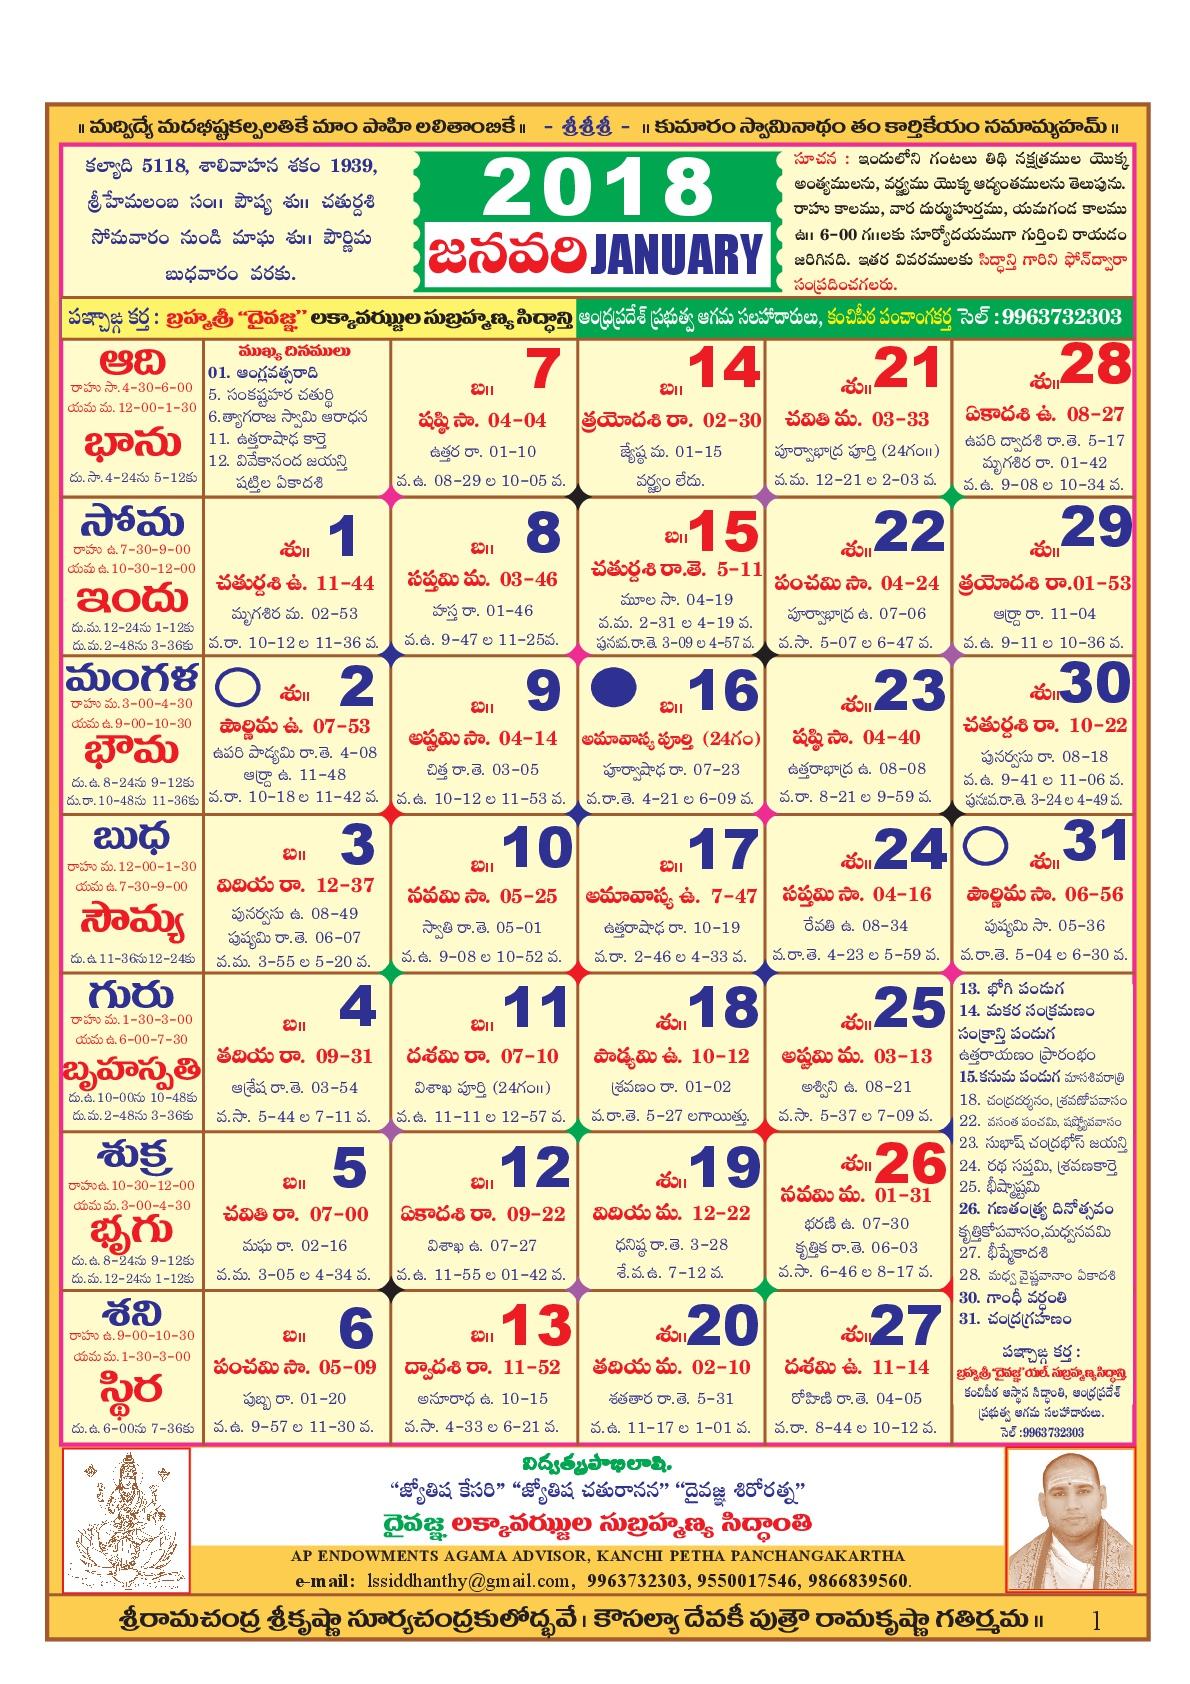 Telugu Calendar 2022 February.Telugu Calendar 2018 With Tithi Festivals Holidays List Pdf Download Ls Siddhanthy S Printable Telugu Calendar Hindupad